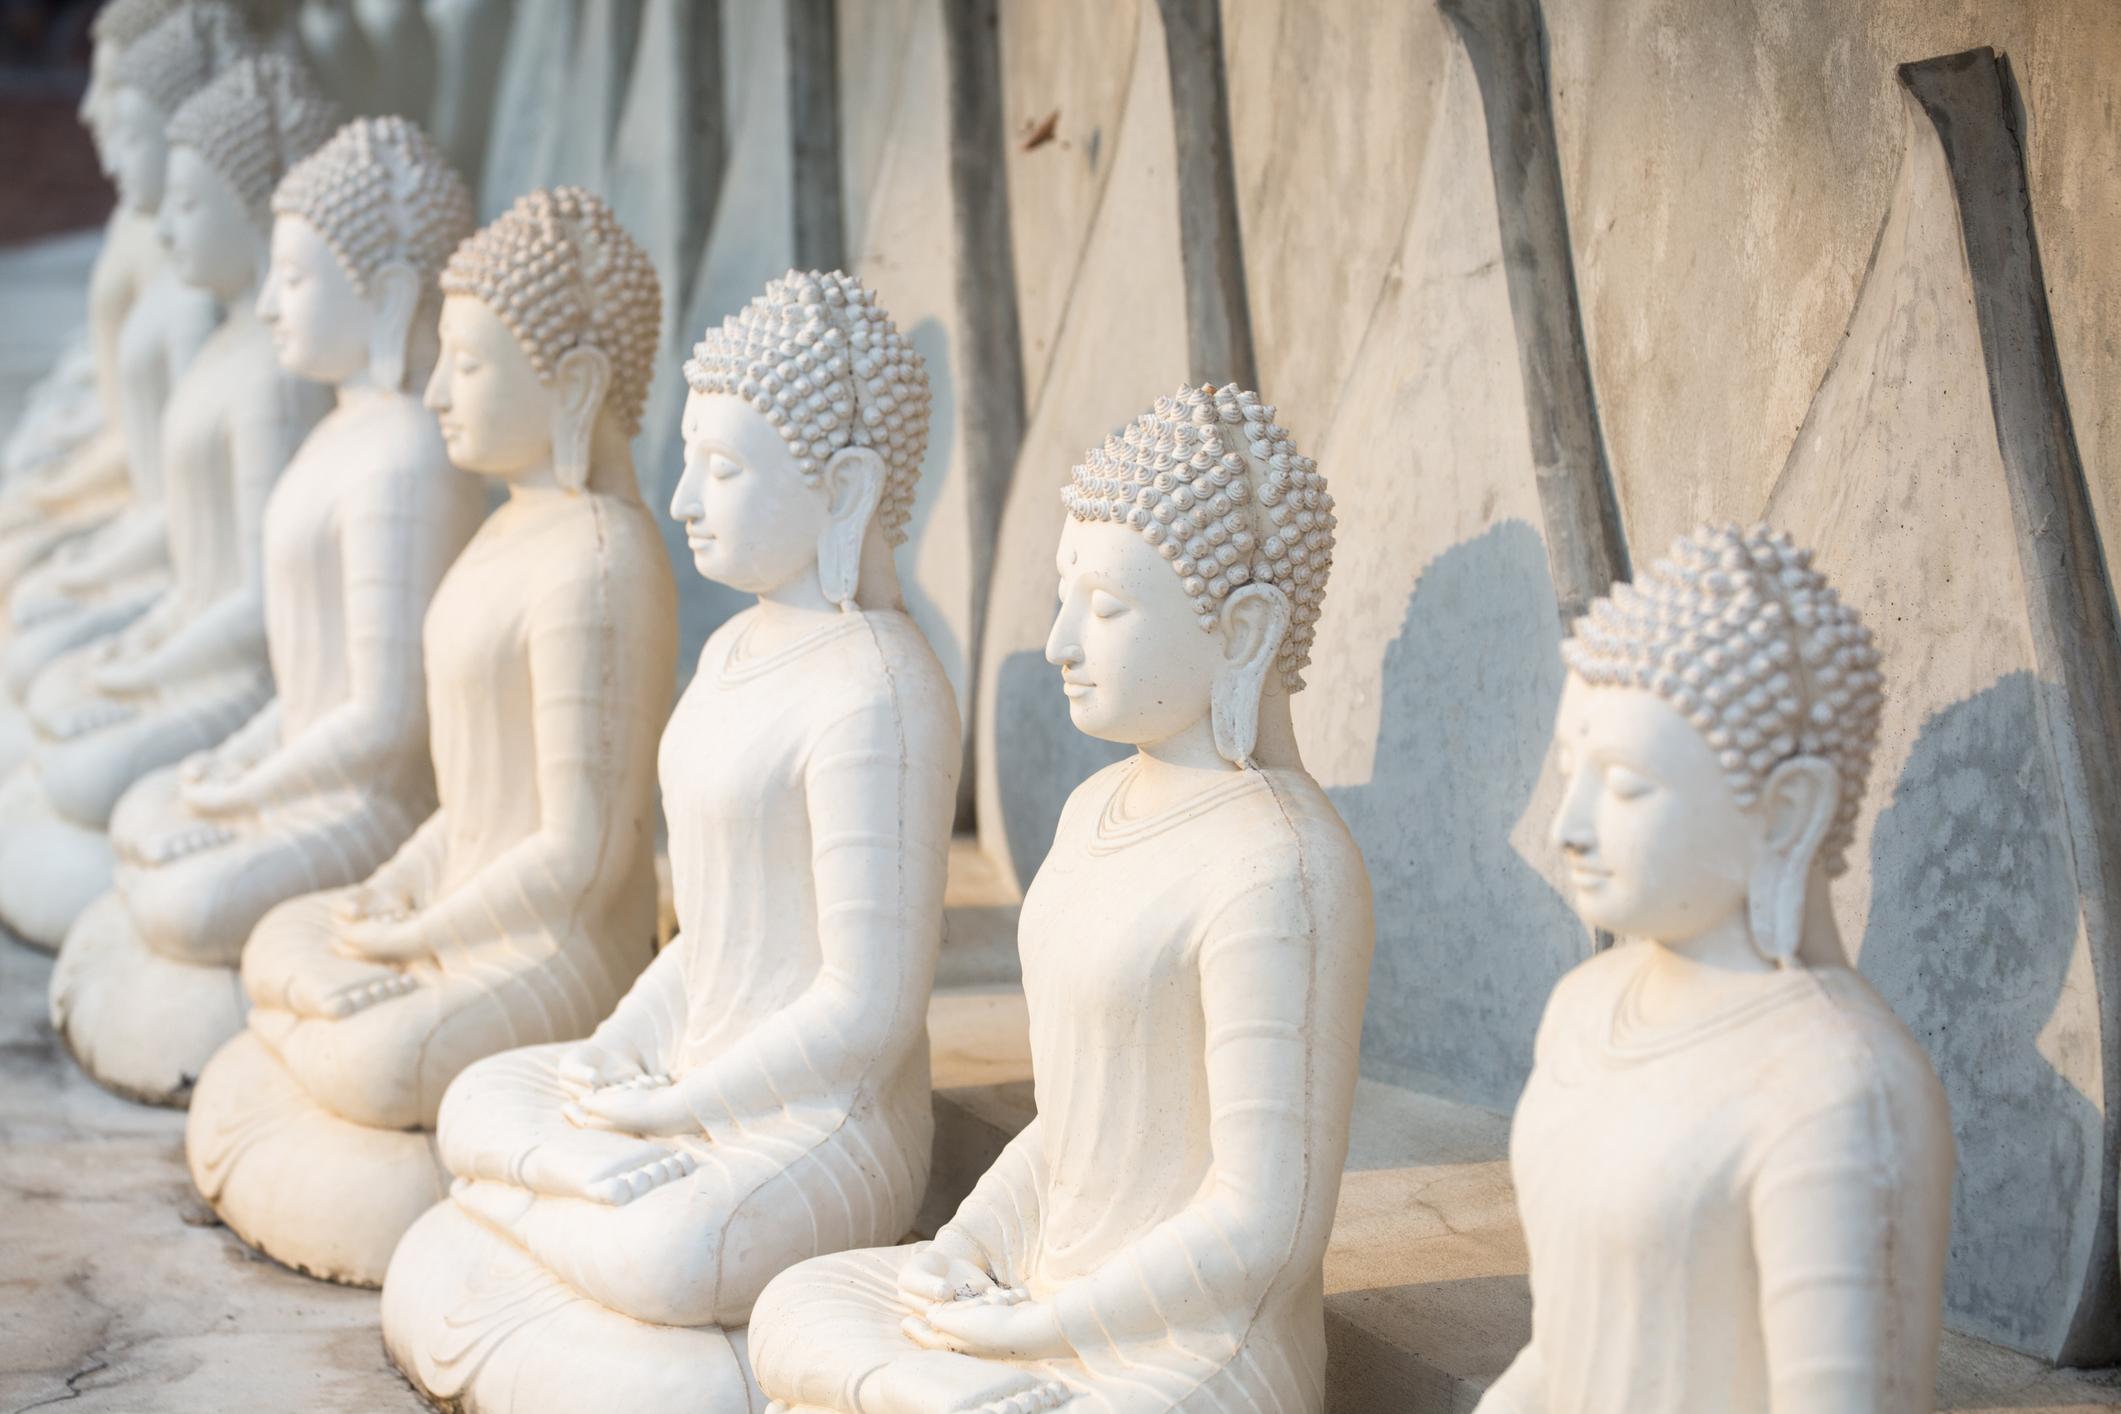 Seeds of Satya (Truth): Meditation, Buddha